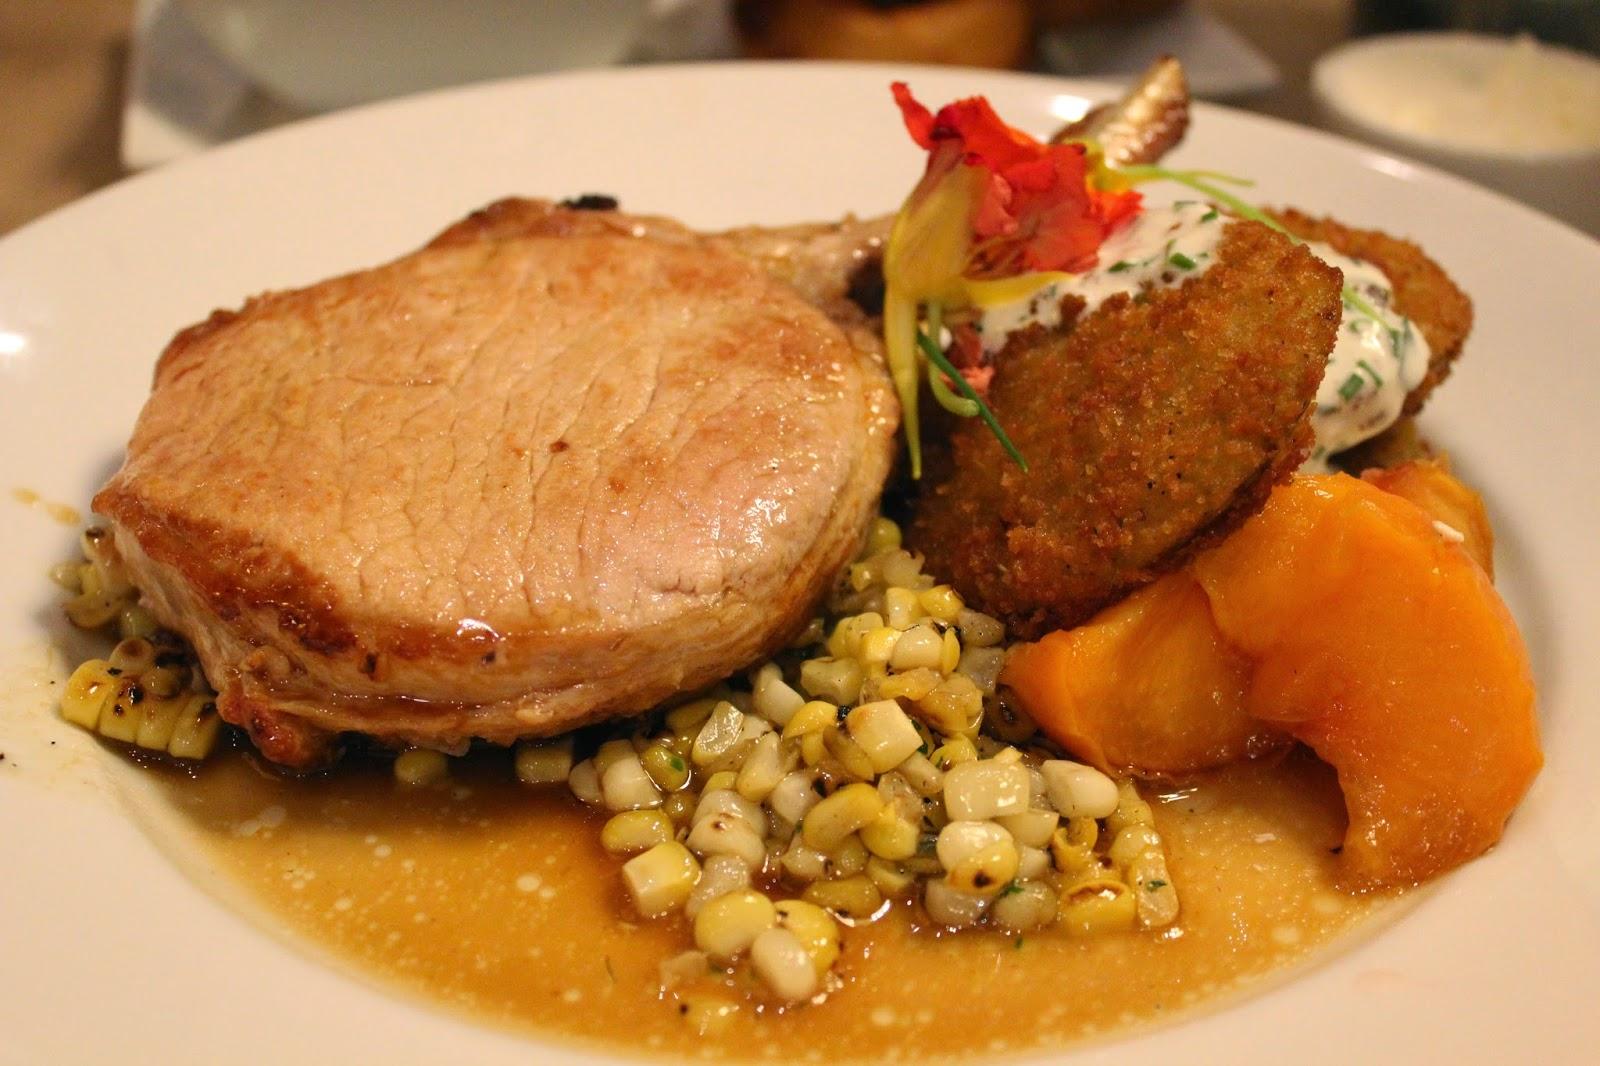 Pork chop at Gibbet Hill Grill, Groton, Mass.